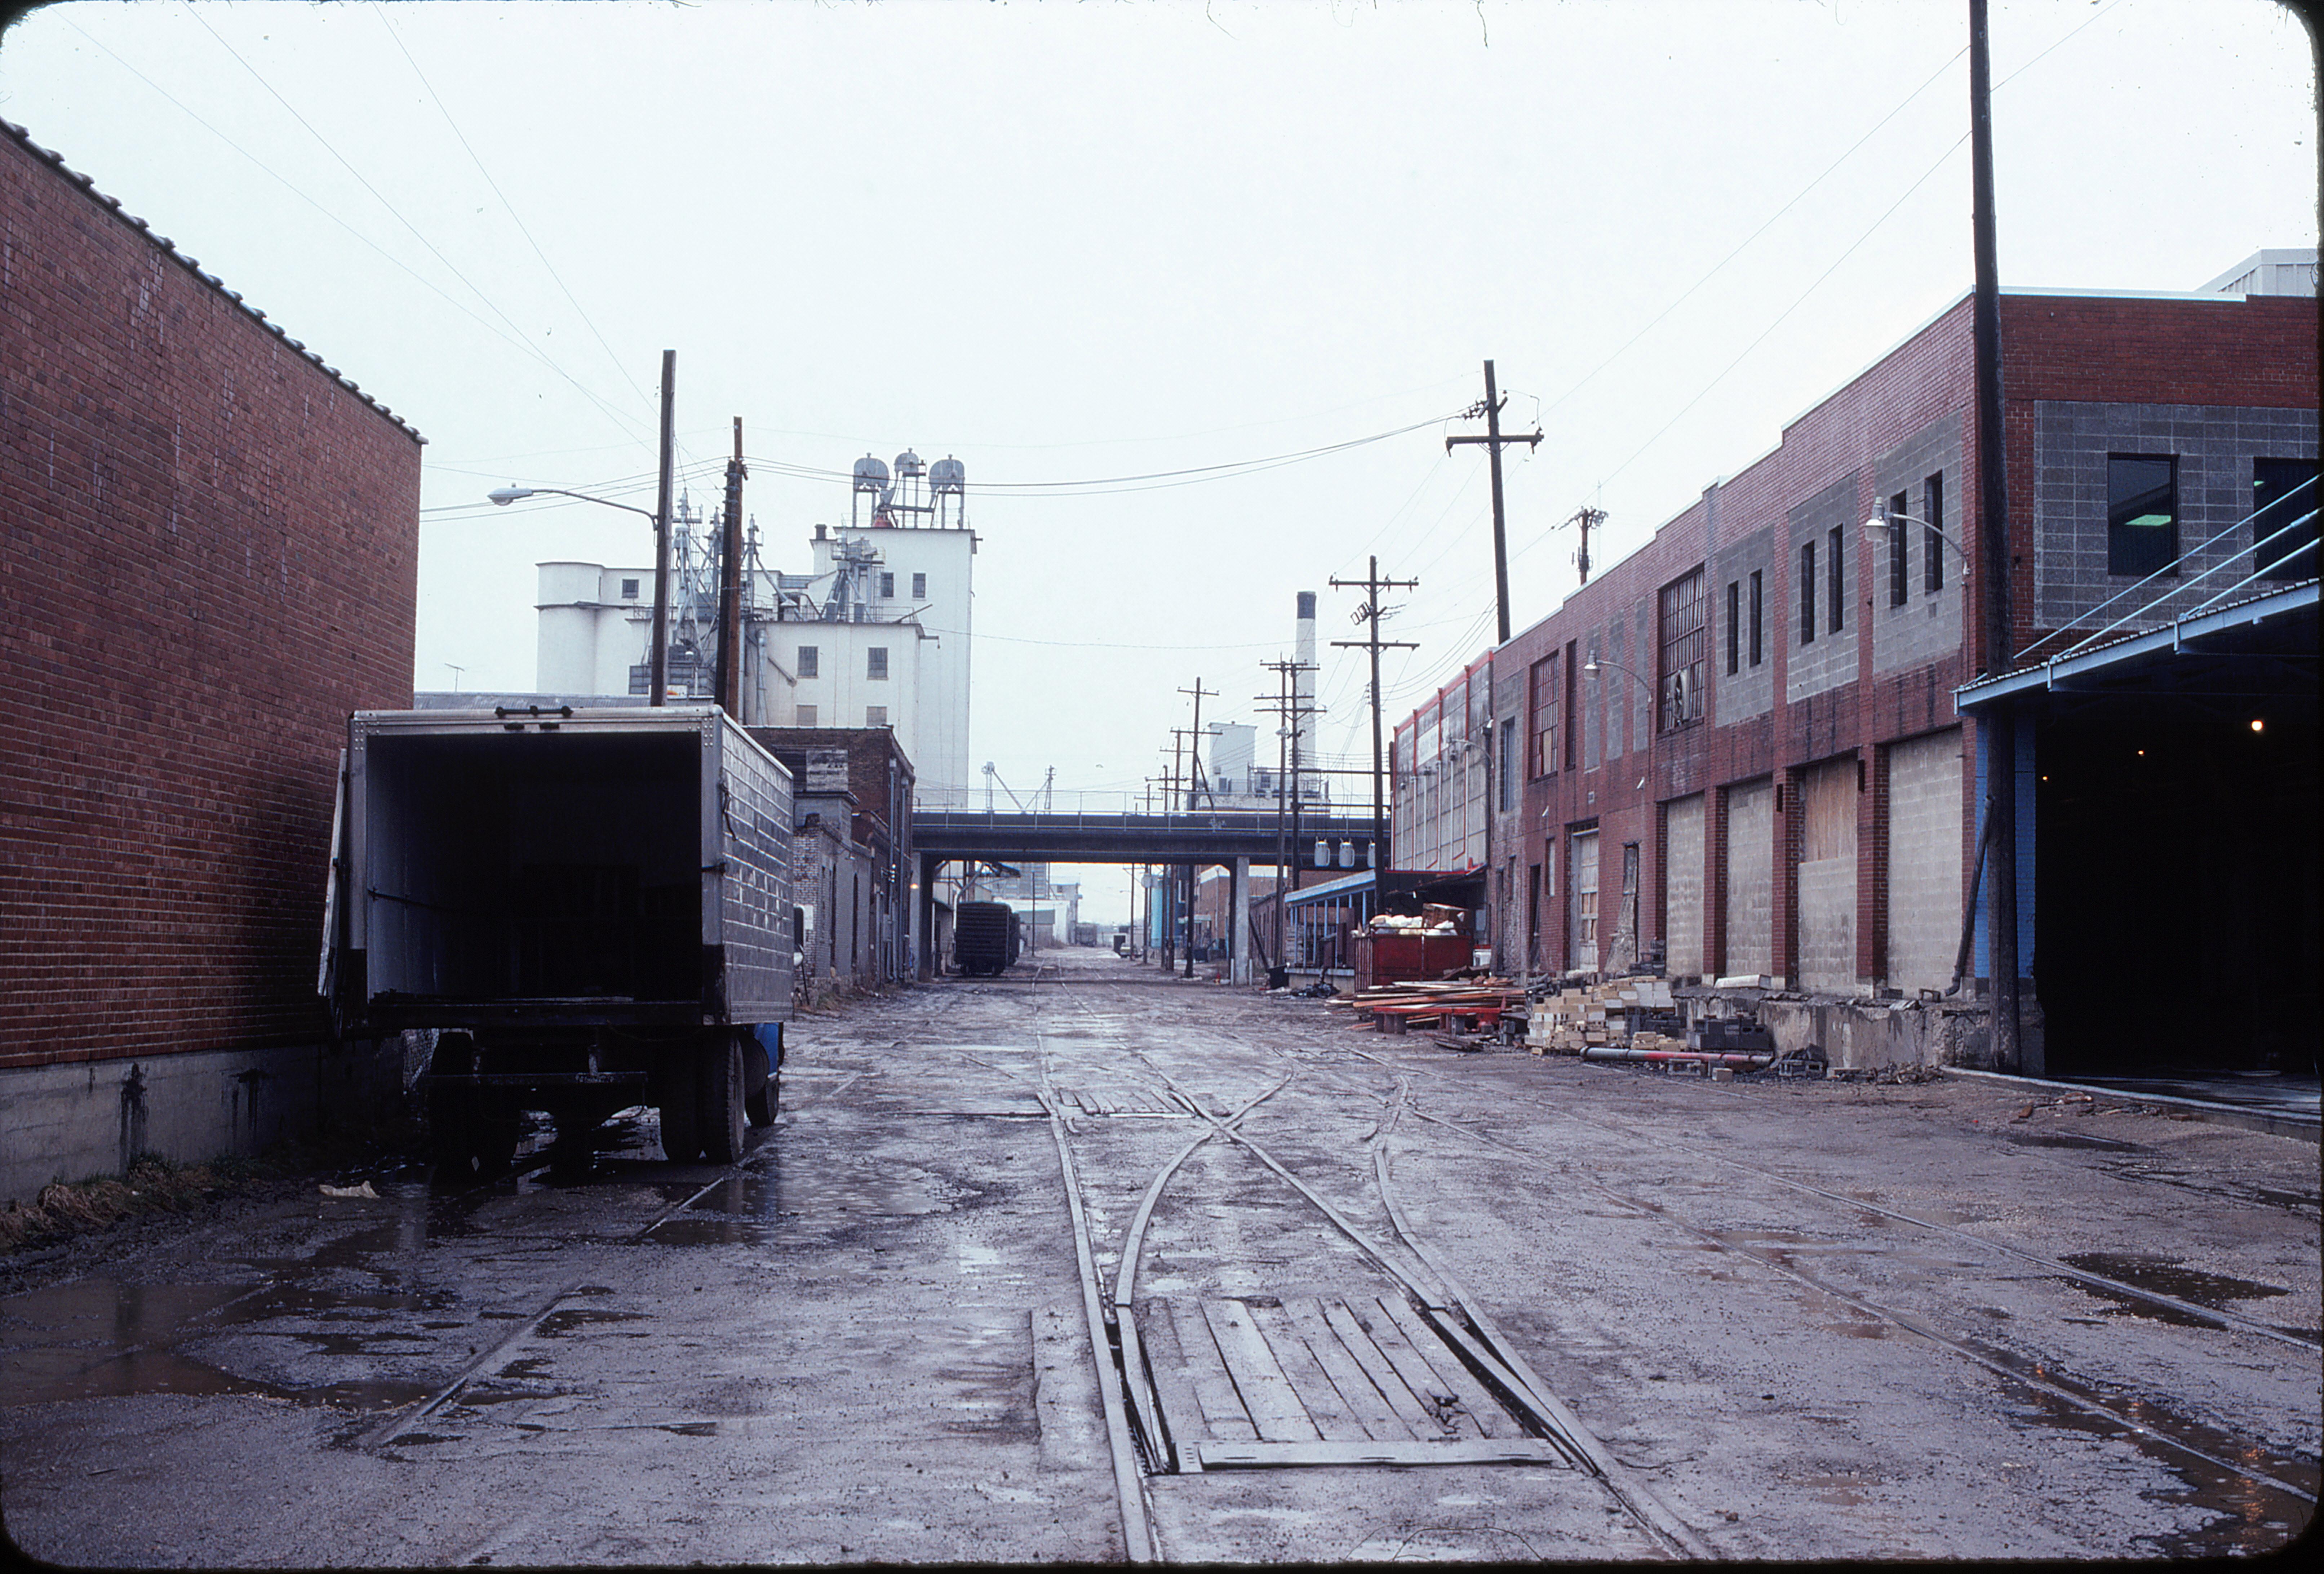 Around the tracks at Springfield, Missouri in March 1980 (Ken McElreath)